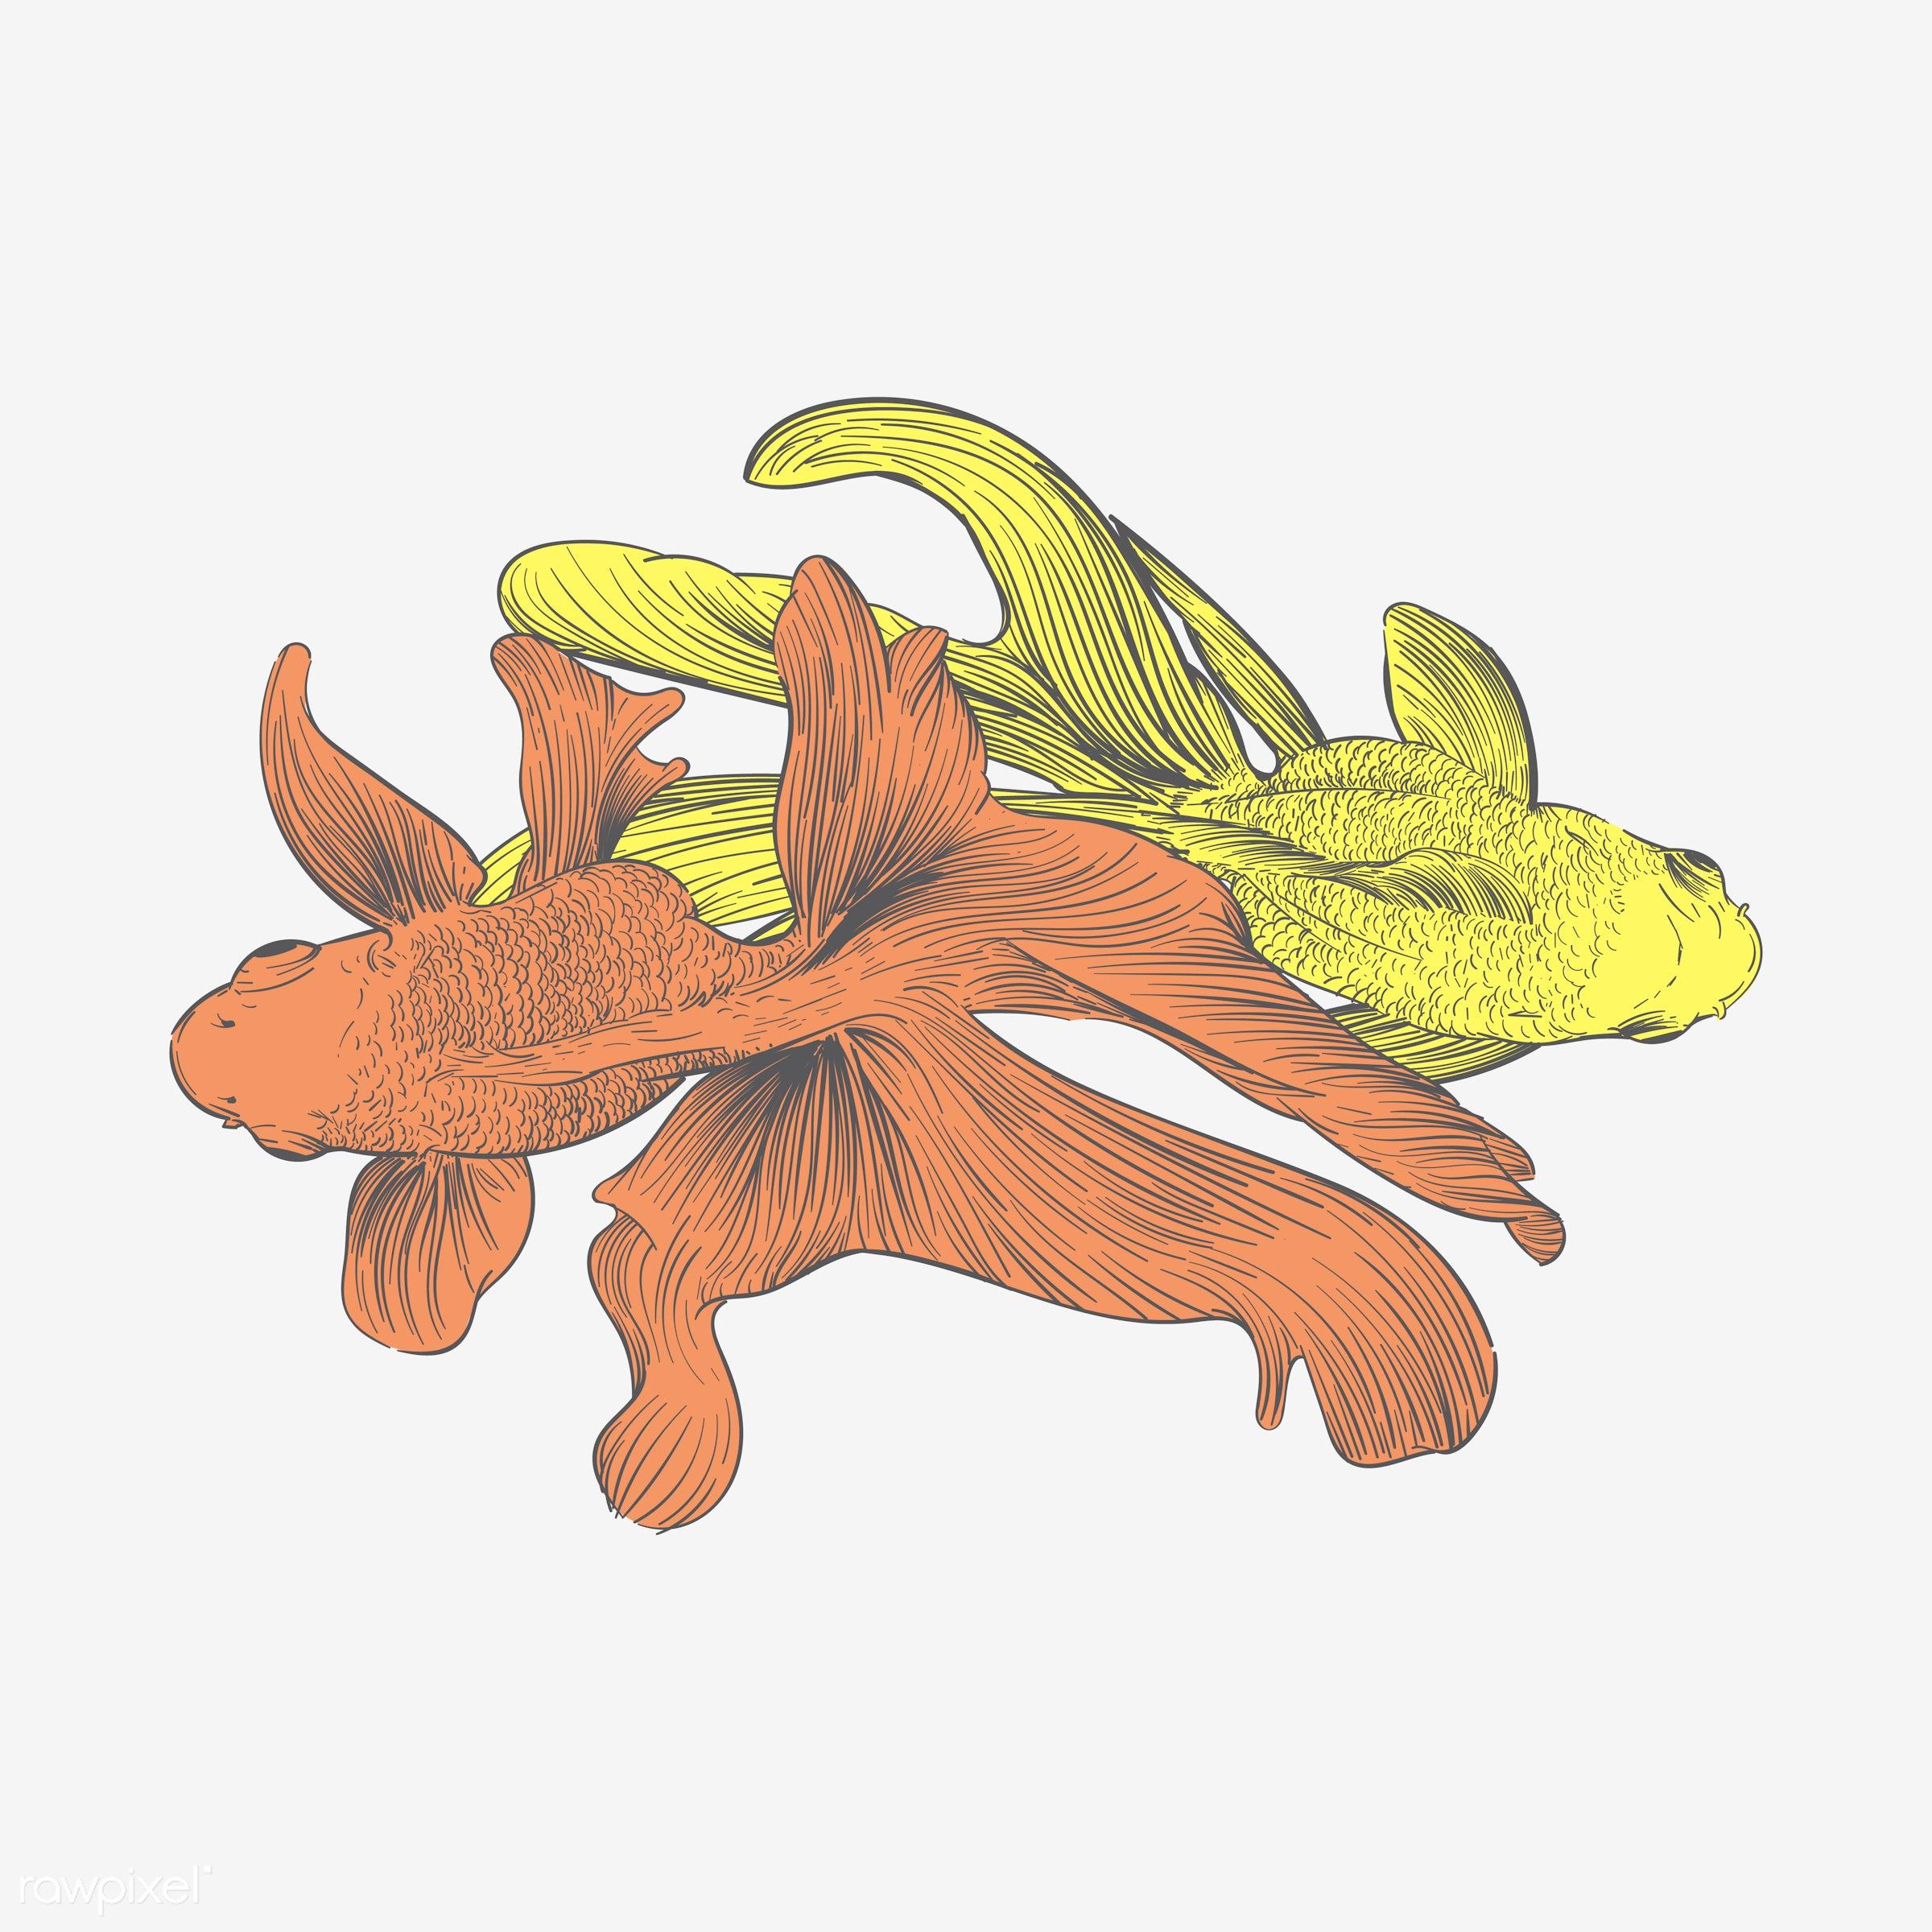 Hand drawing illustration of individuality concept - animal, art, artwork, contrast, creative, creativity, design,...